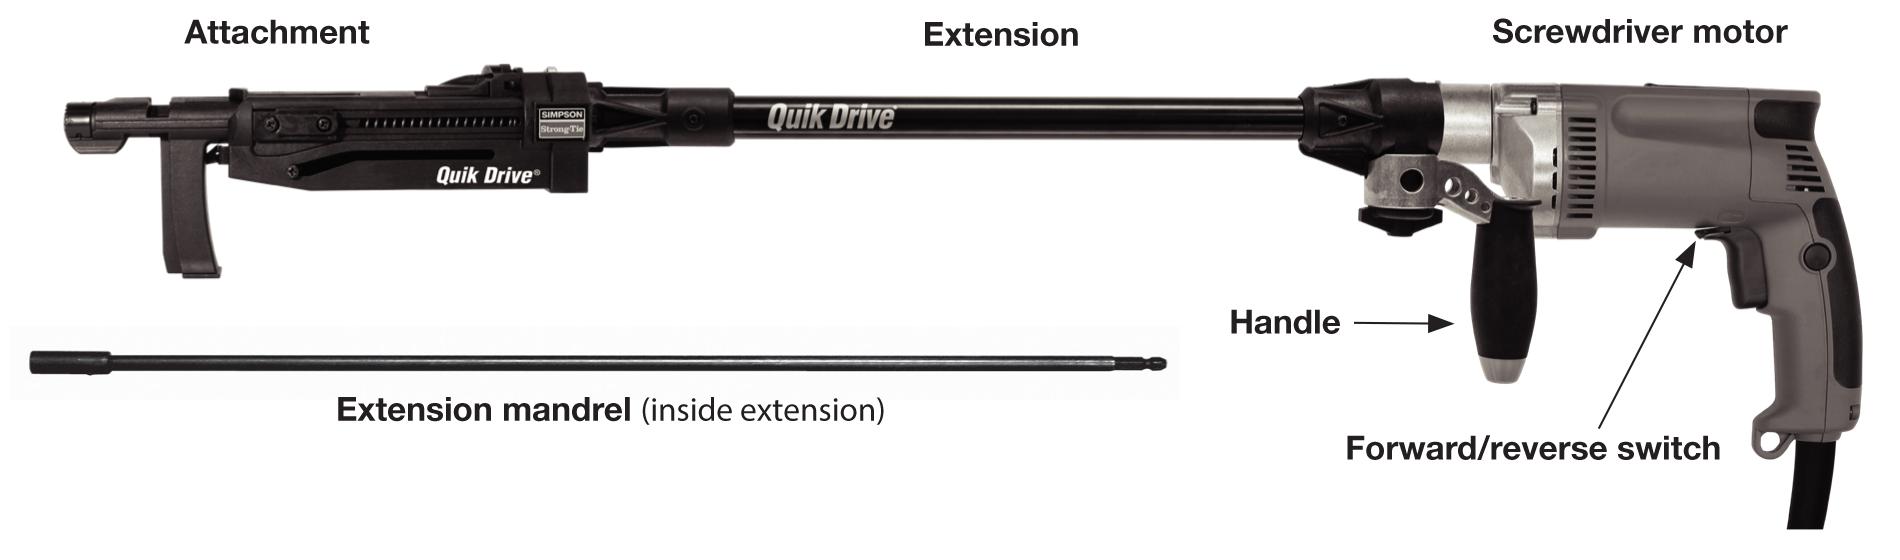 Quik Drive System Components